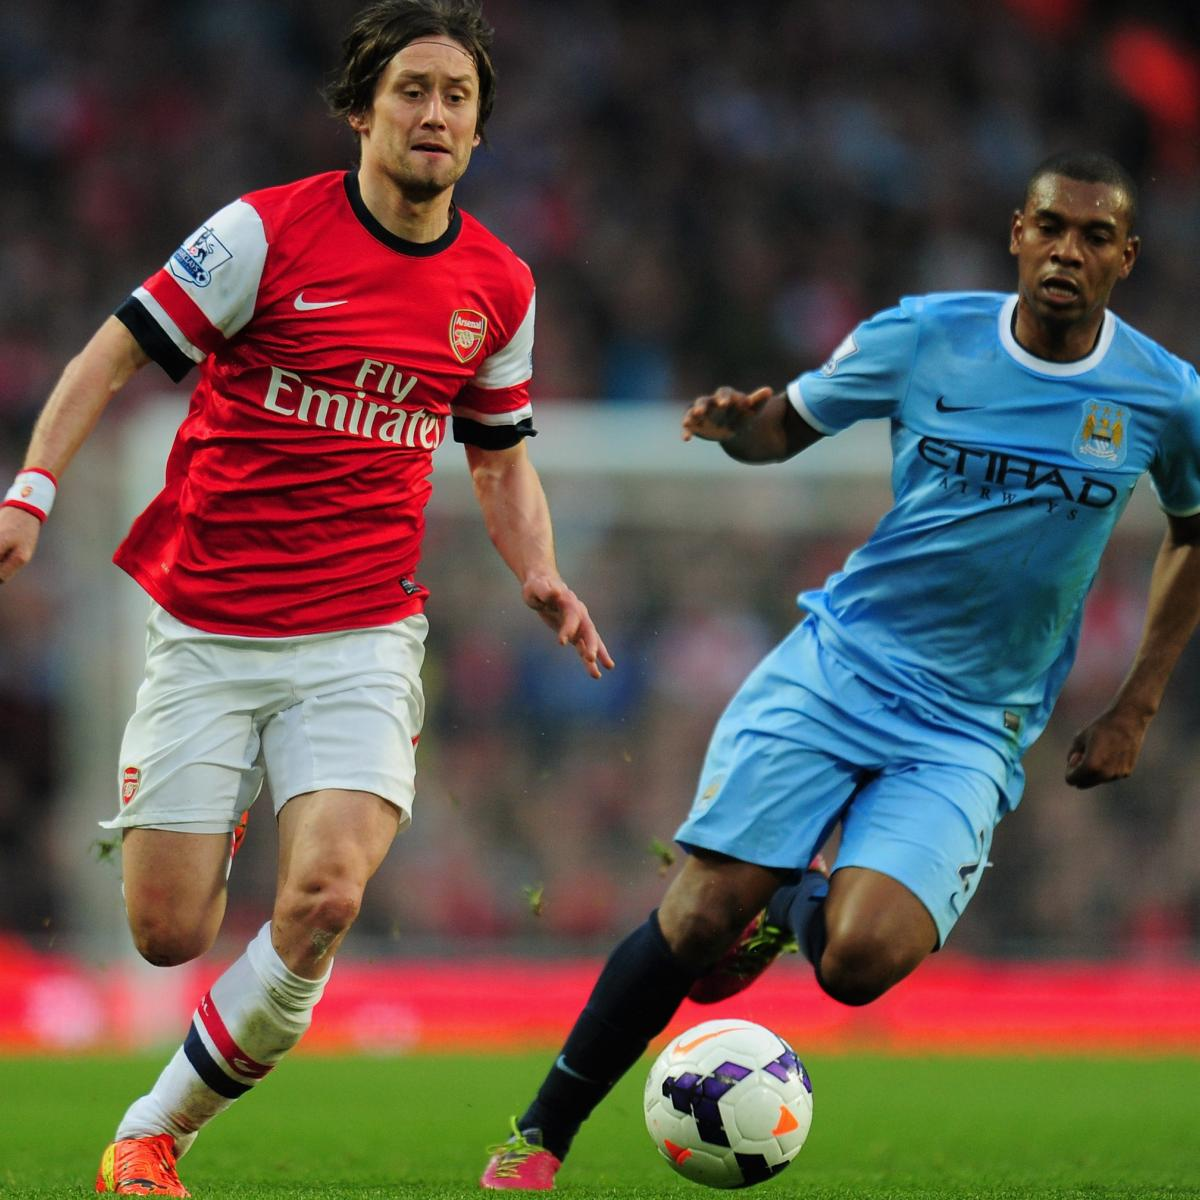 Arsenal Vs Tottenham Live Score Highlights From Premier: Arsenal Vs. Manchester City: Premier League Live Score